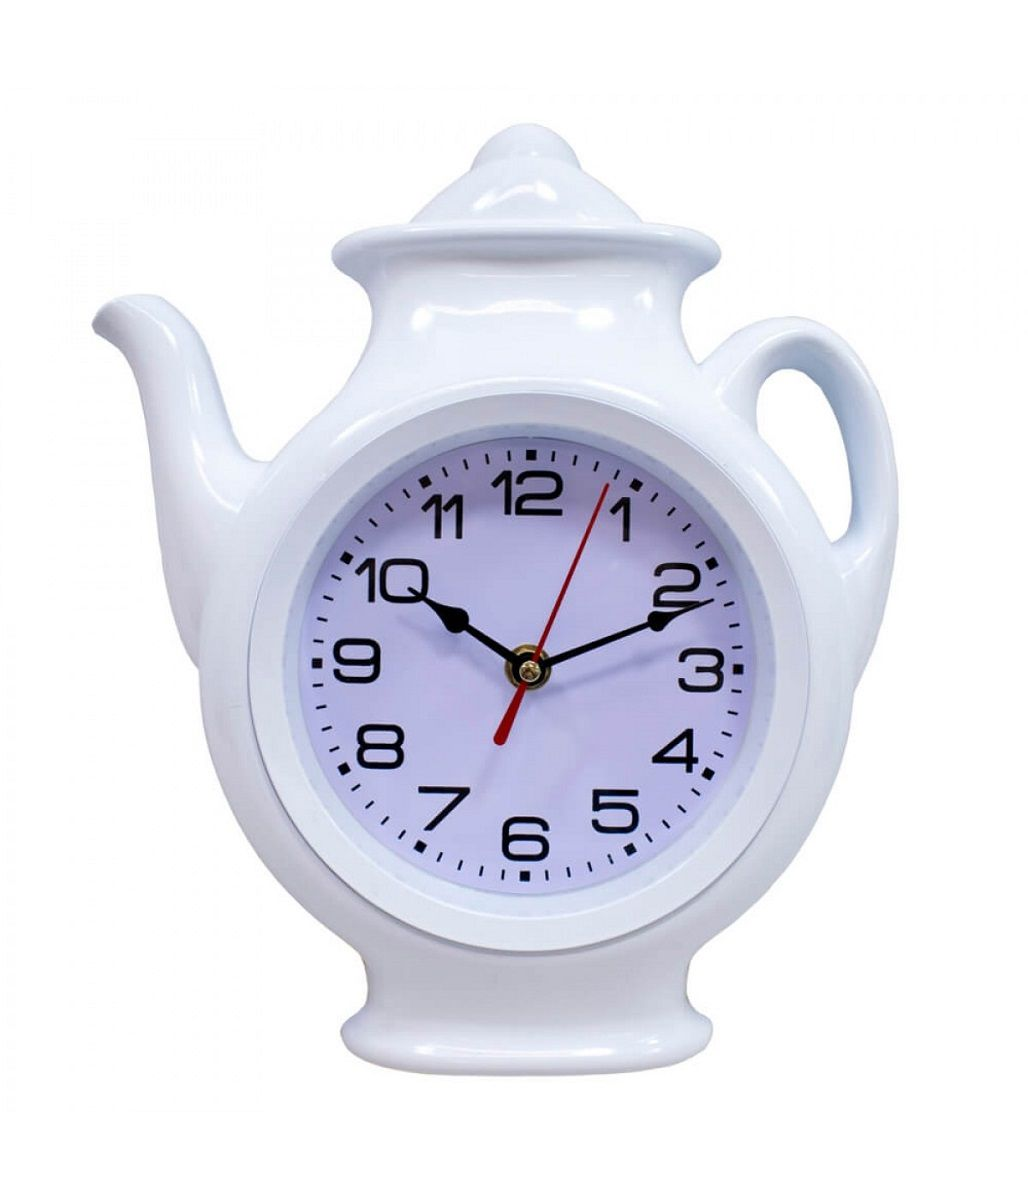 Relógio De Parede Analógico  Branco Bule 29x24.5cm